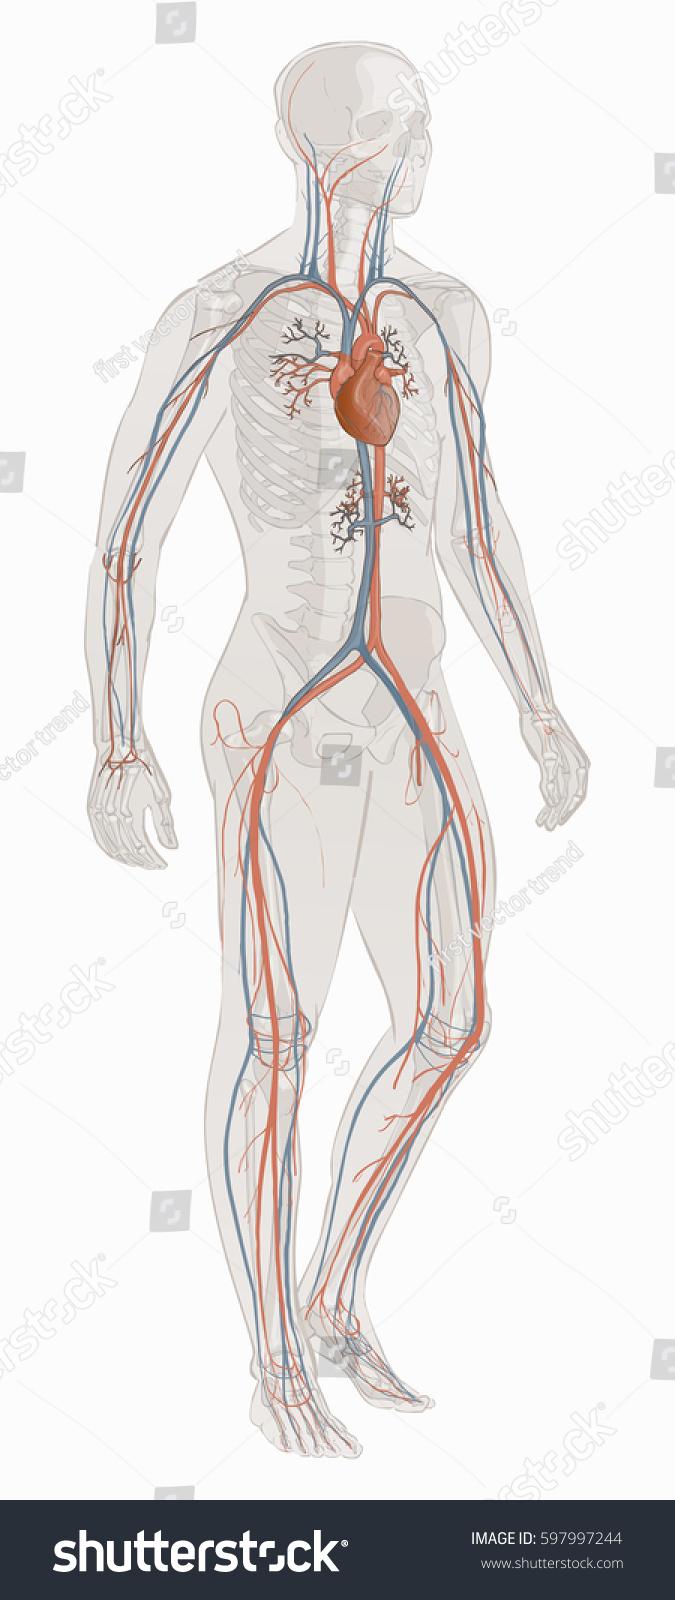 Human Body Parts Circulatory Vascular System Stock Vector 597997244 ...